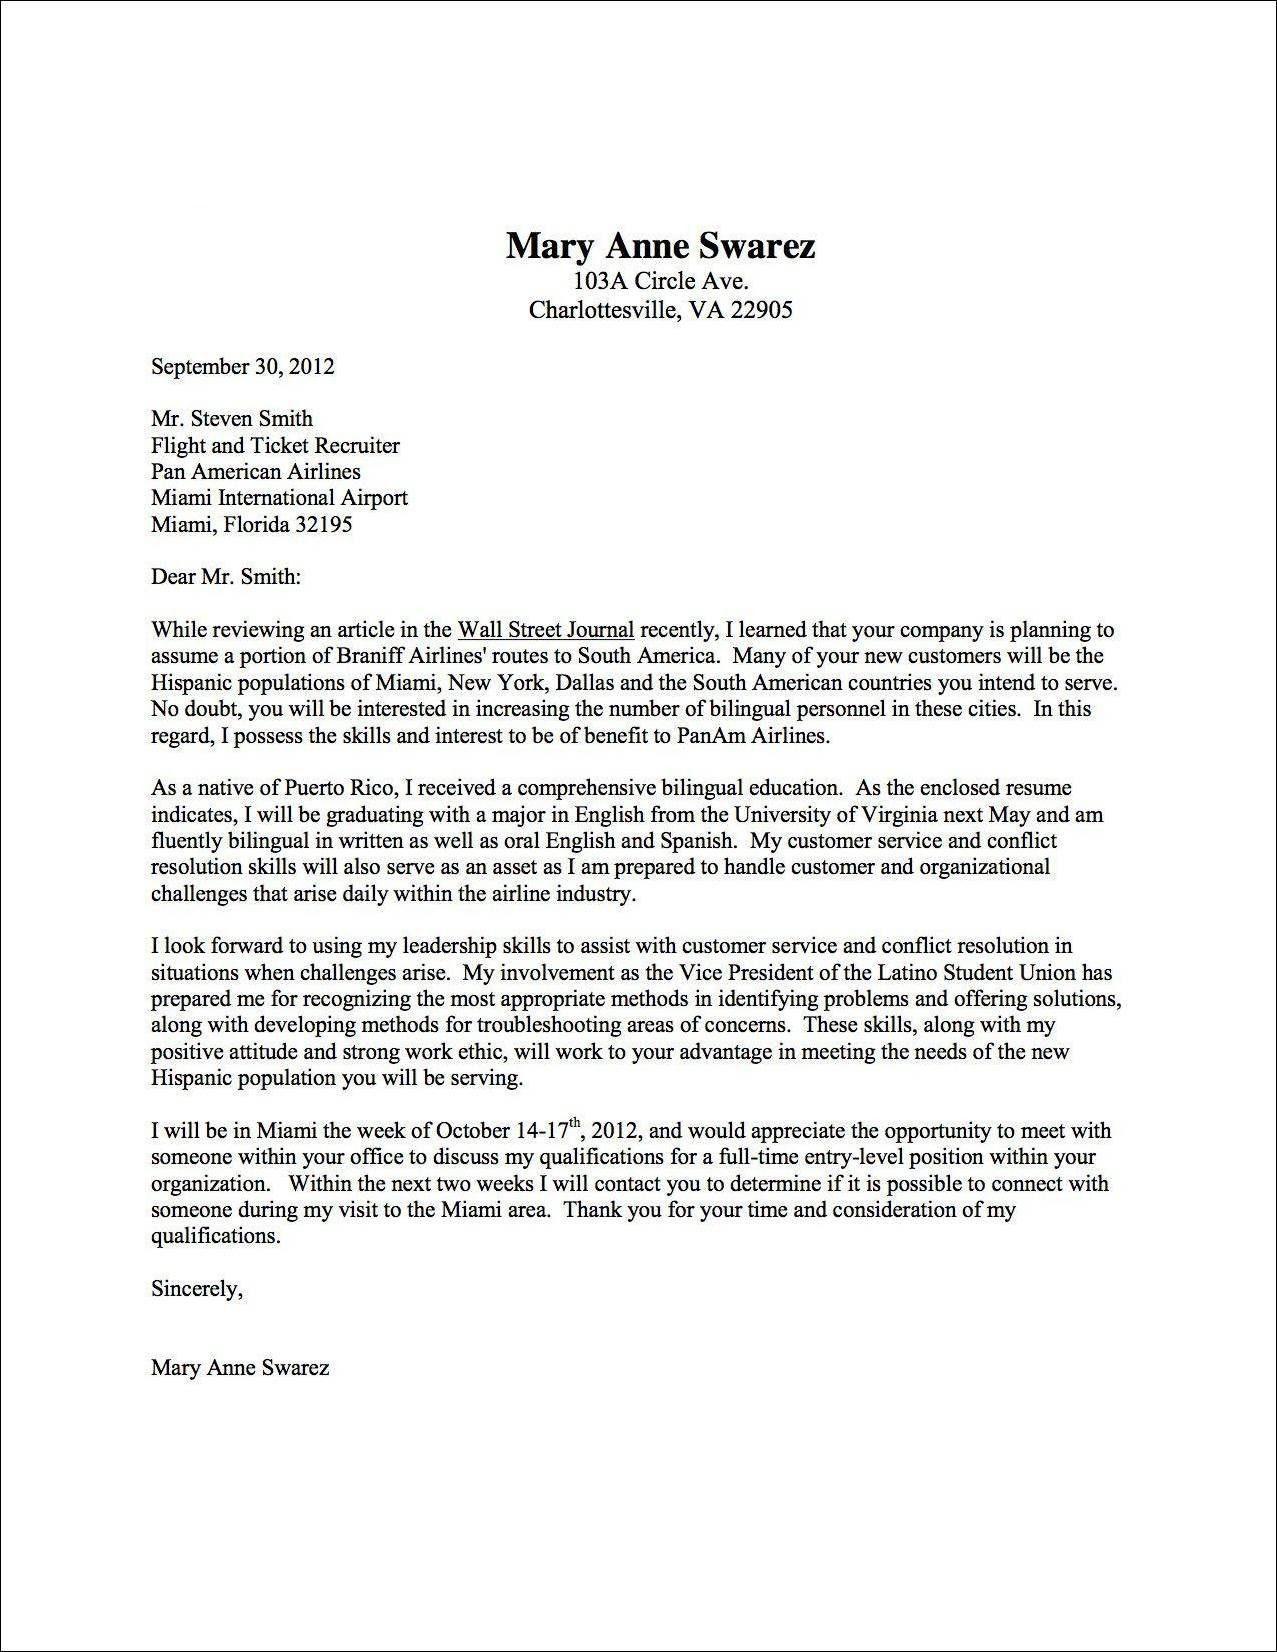 25 Cover Letter Opening Cover Letter For Resume Writing A Cover Letter Cover Letter Example